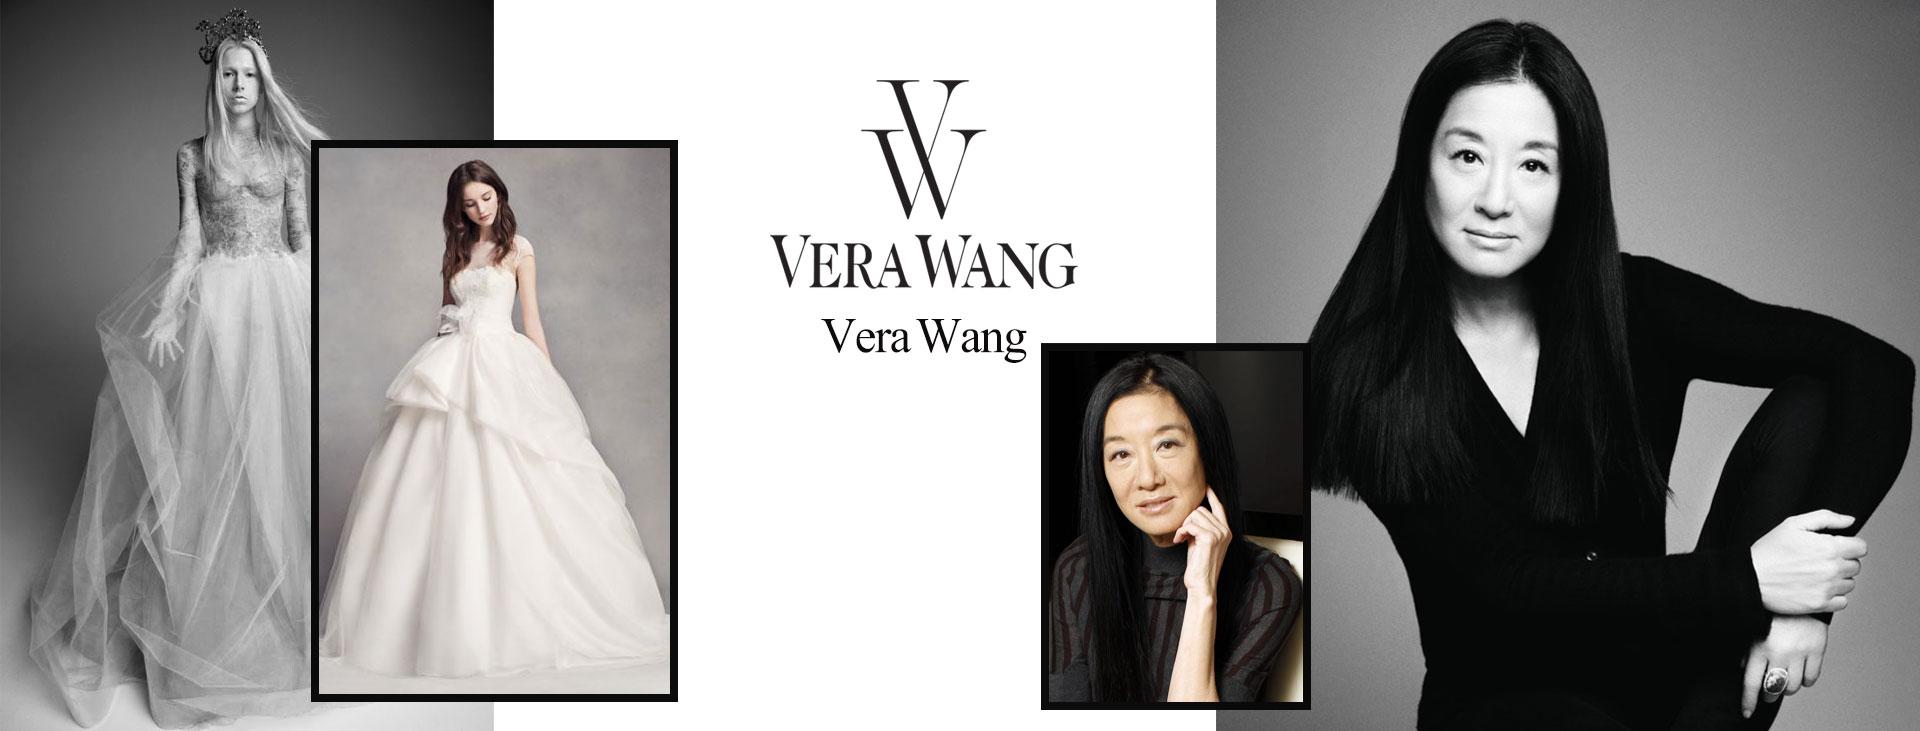 Vera Wang 1 - زنان پیشگام در صنعت مد